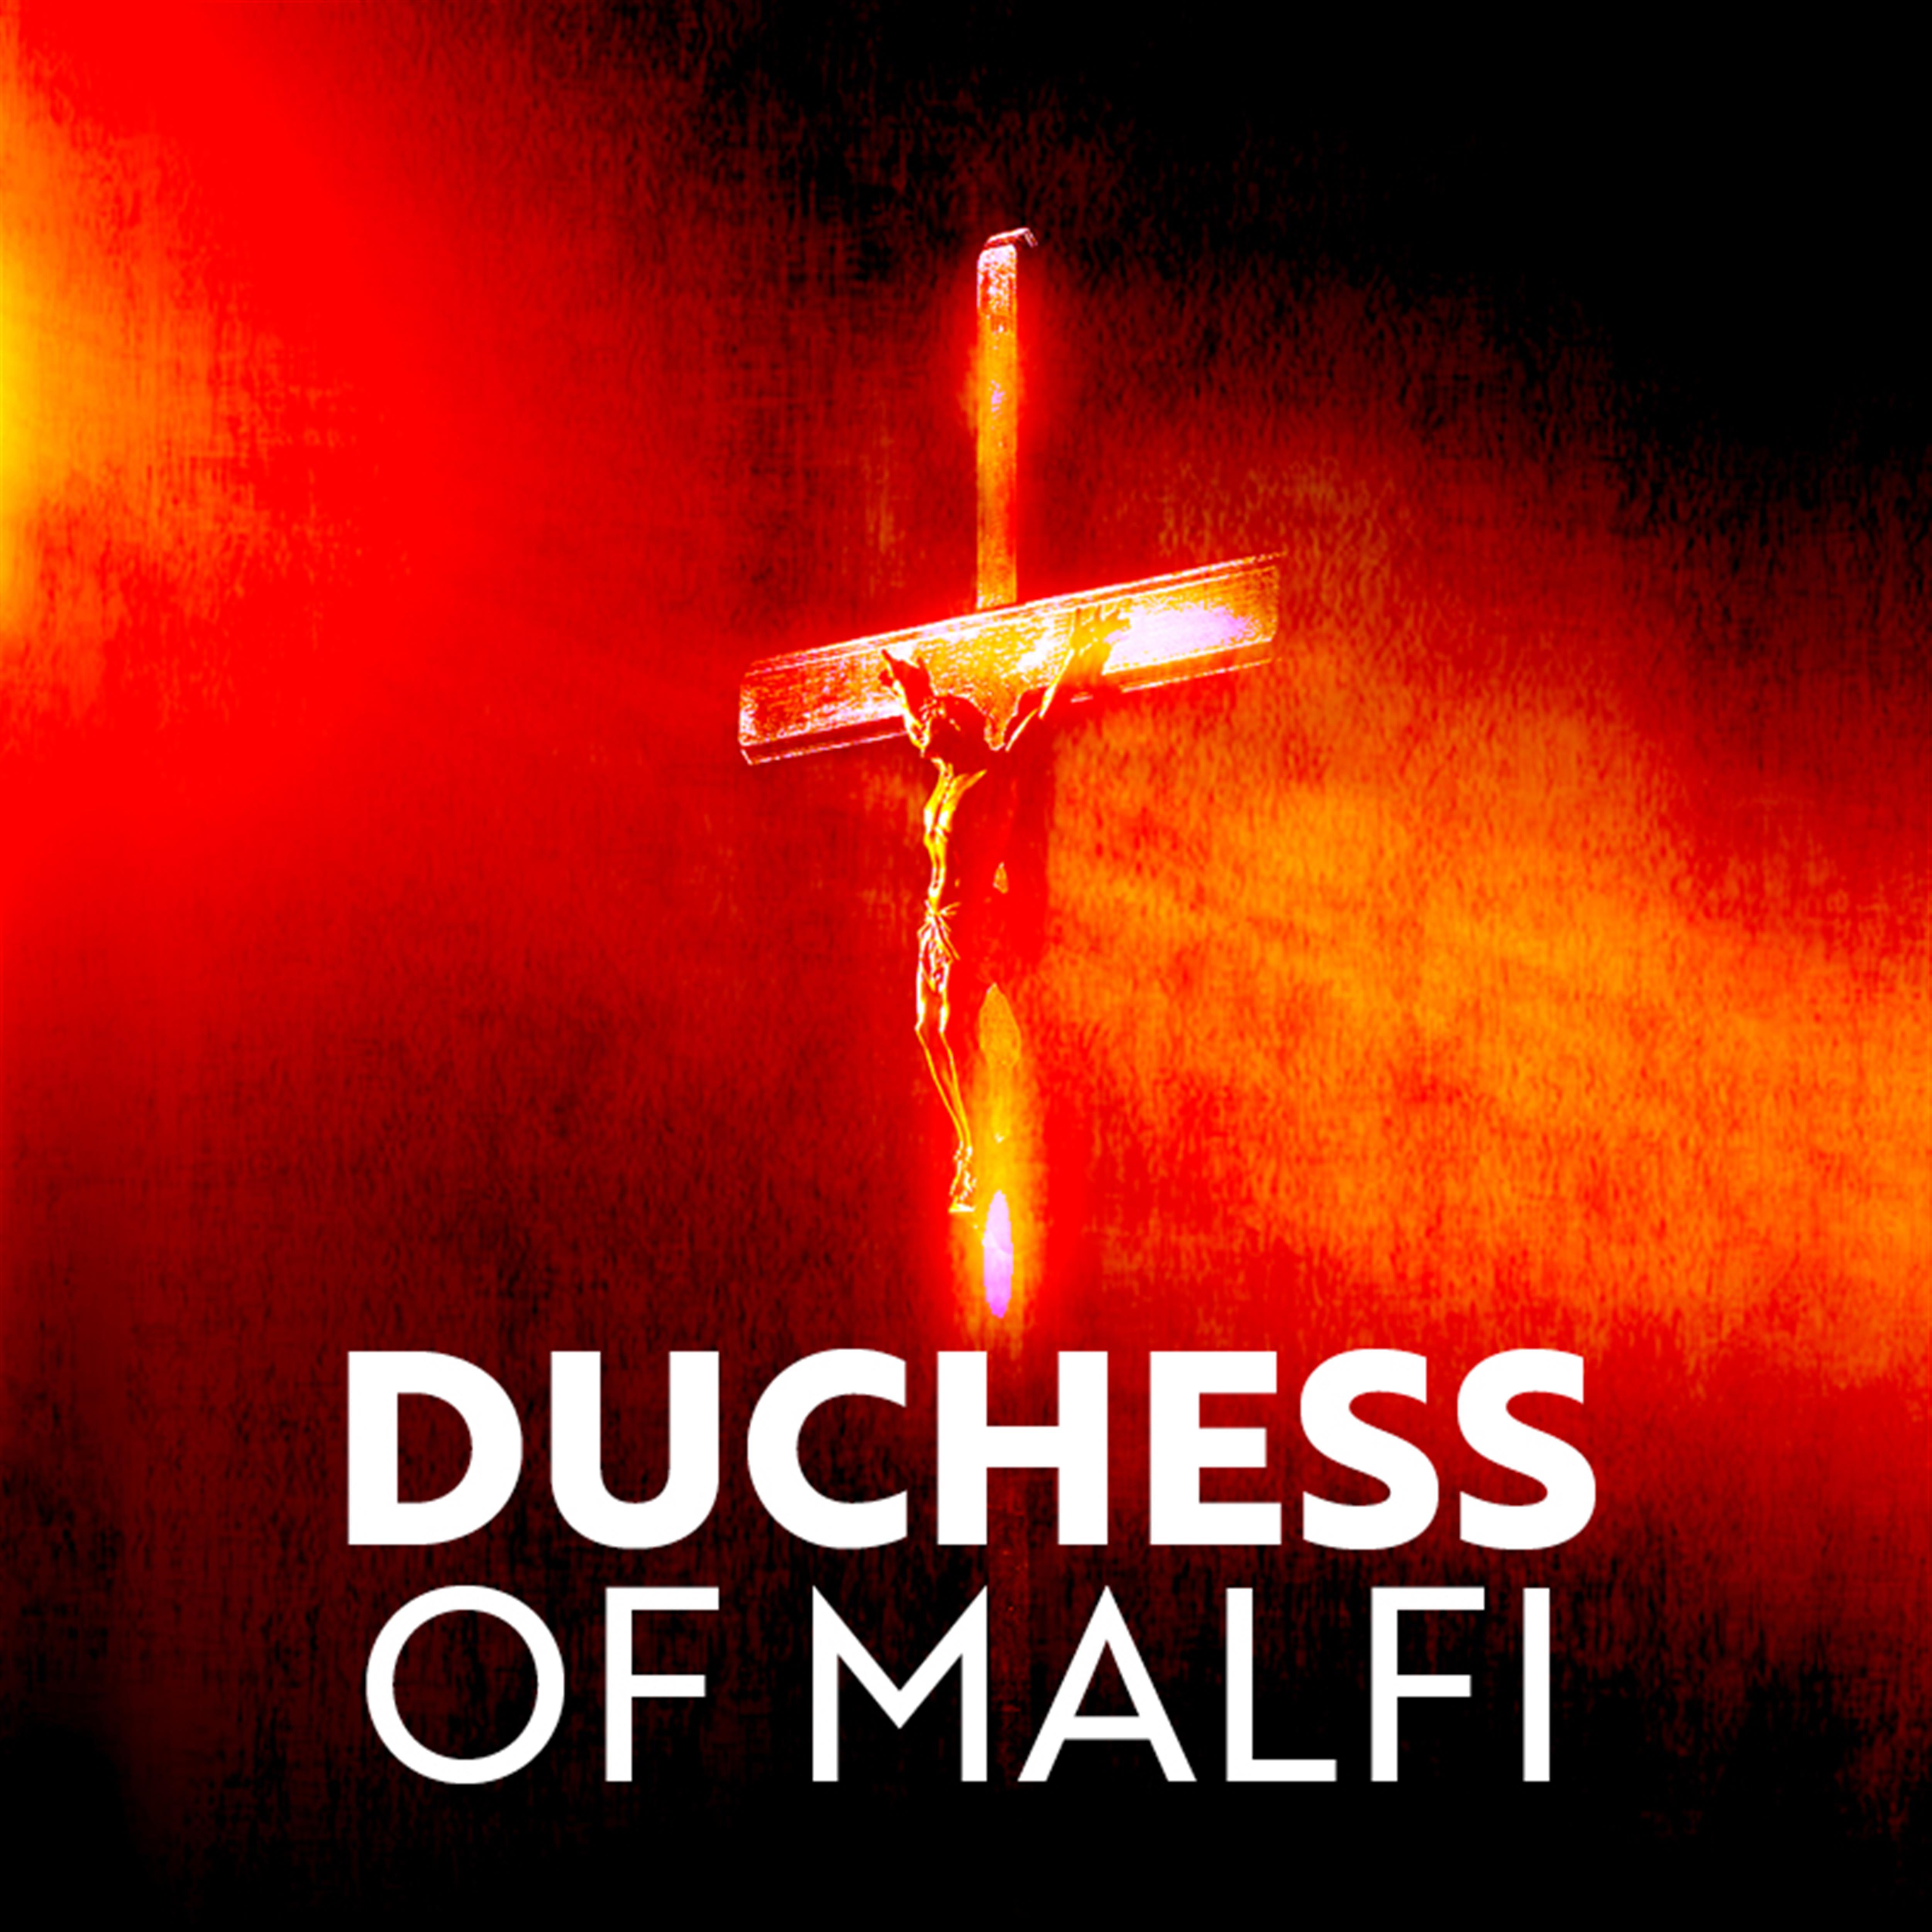 Duchess of Malfi (BA Acting)